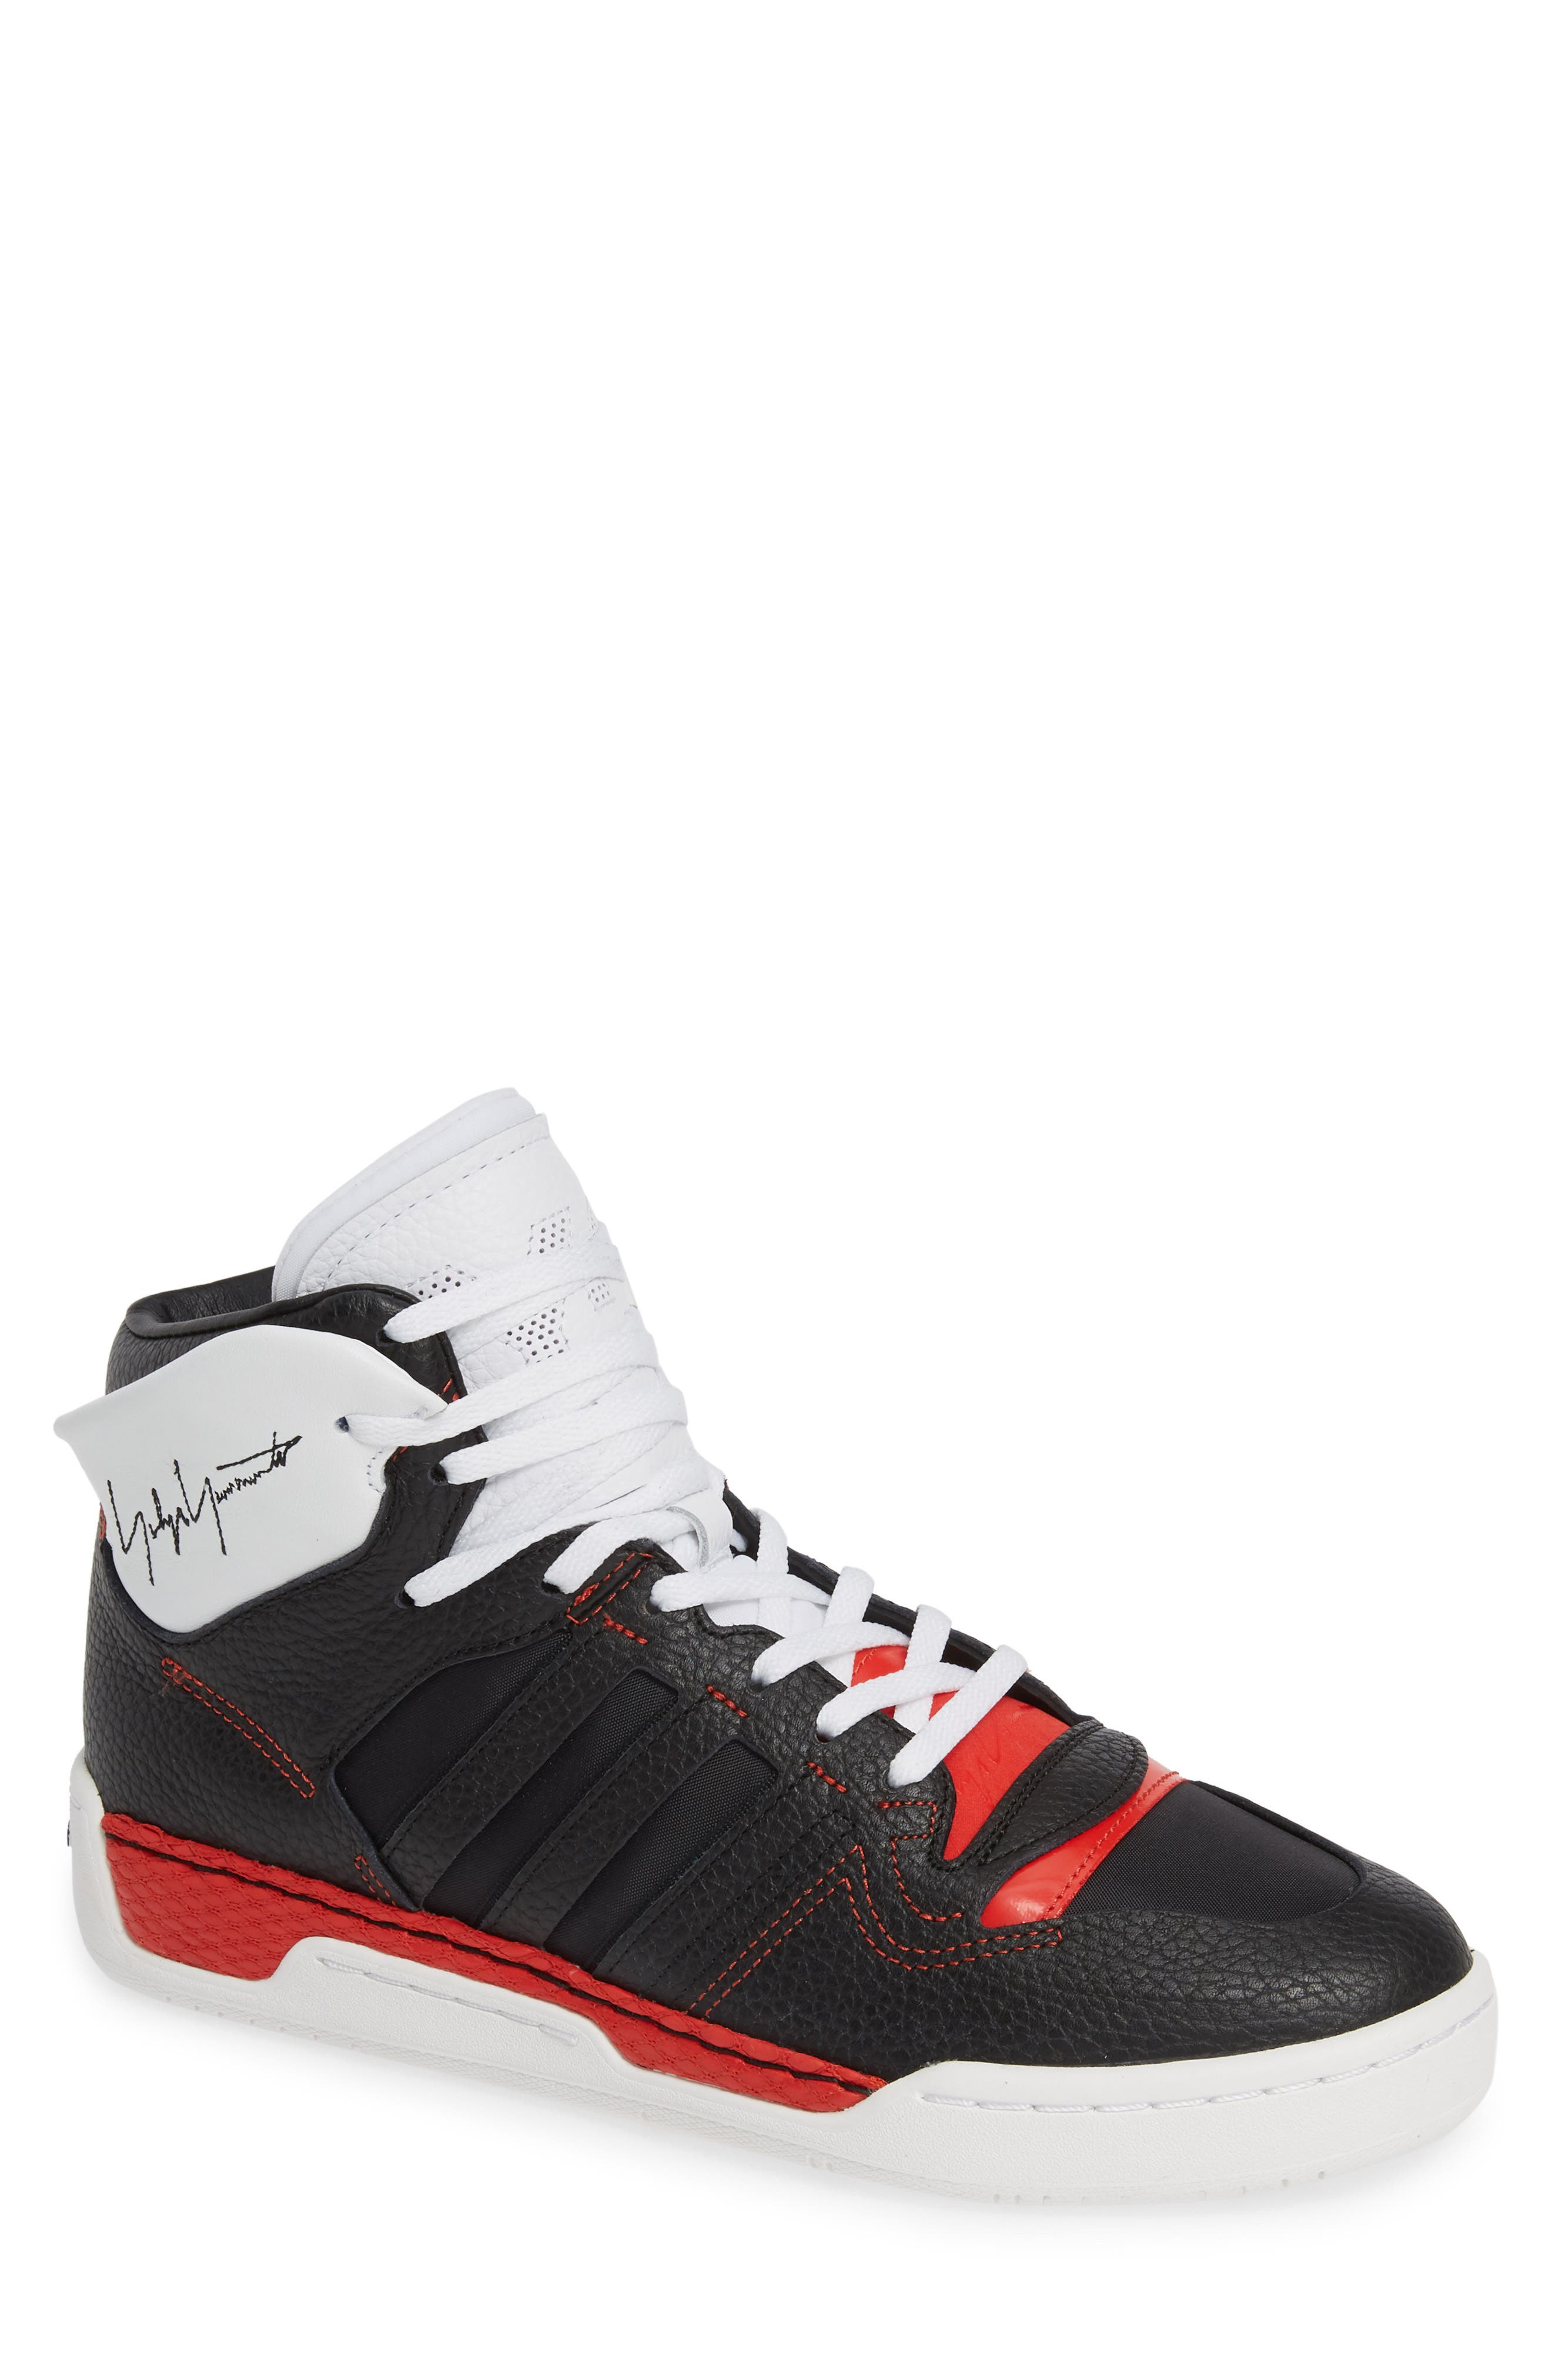 Y-3, x adidas Hayworth High Top Sneaker, Main thumbnail 1, color, BLACK/ BLACK/ RED